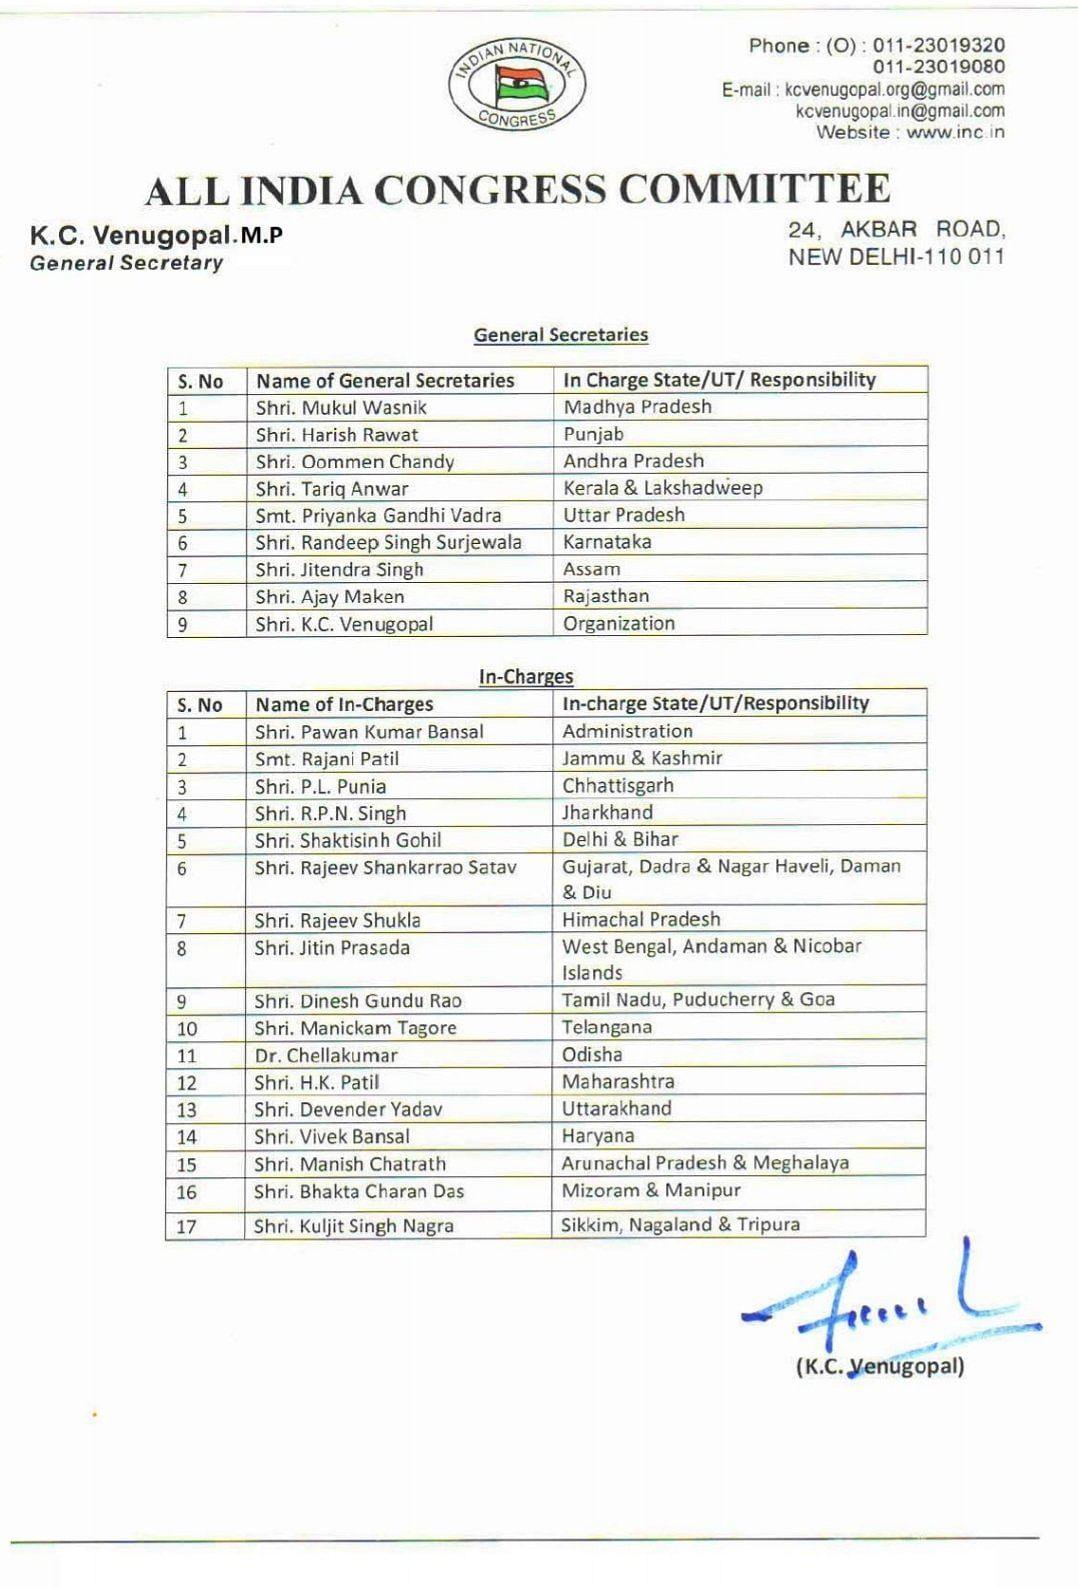 Rahul lobby dominates in rejig of INC; Azad no longer GS